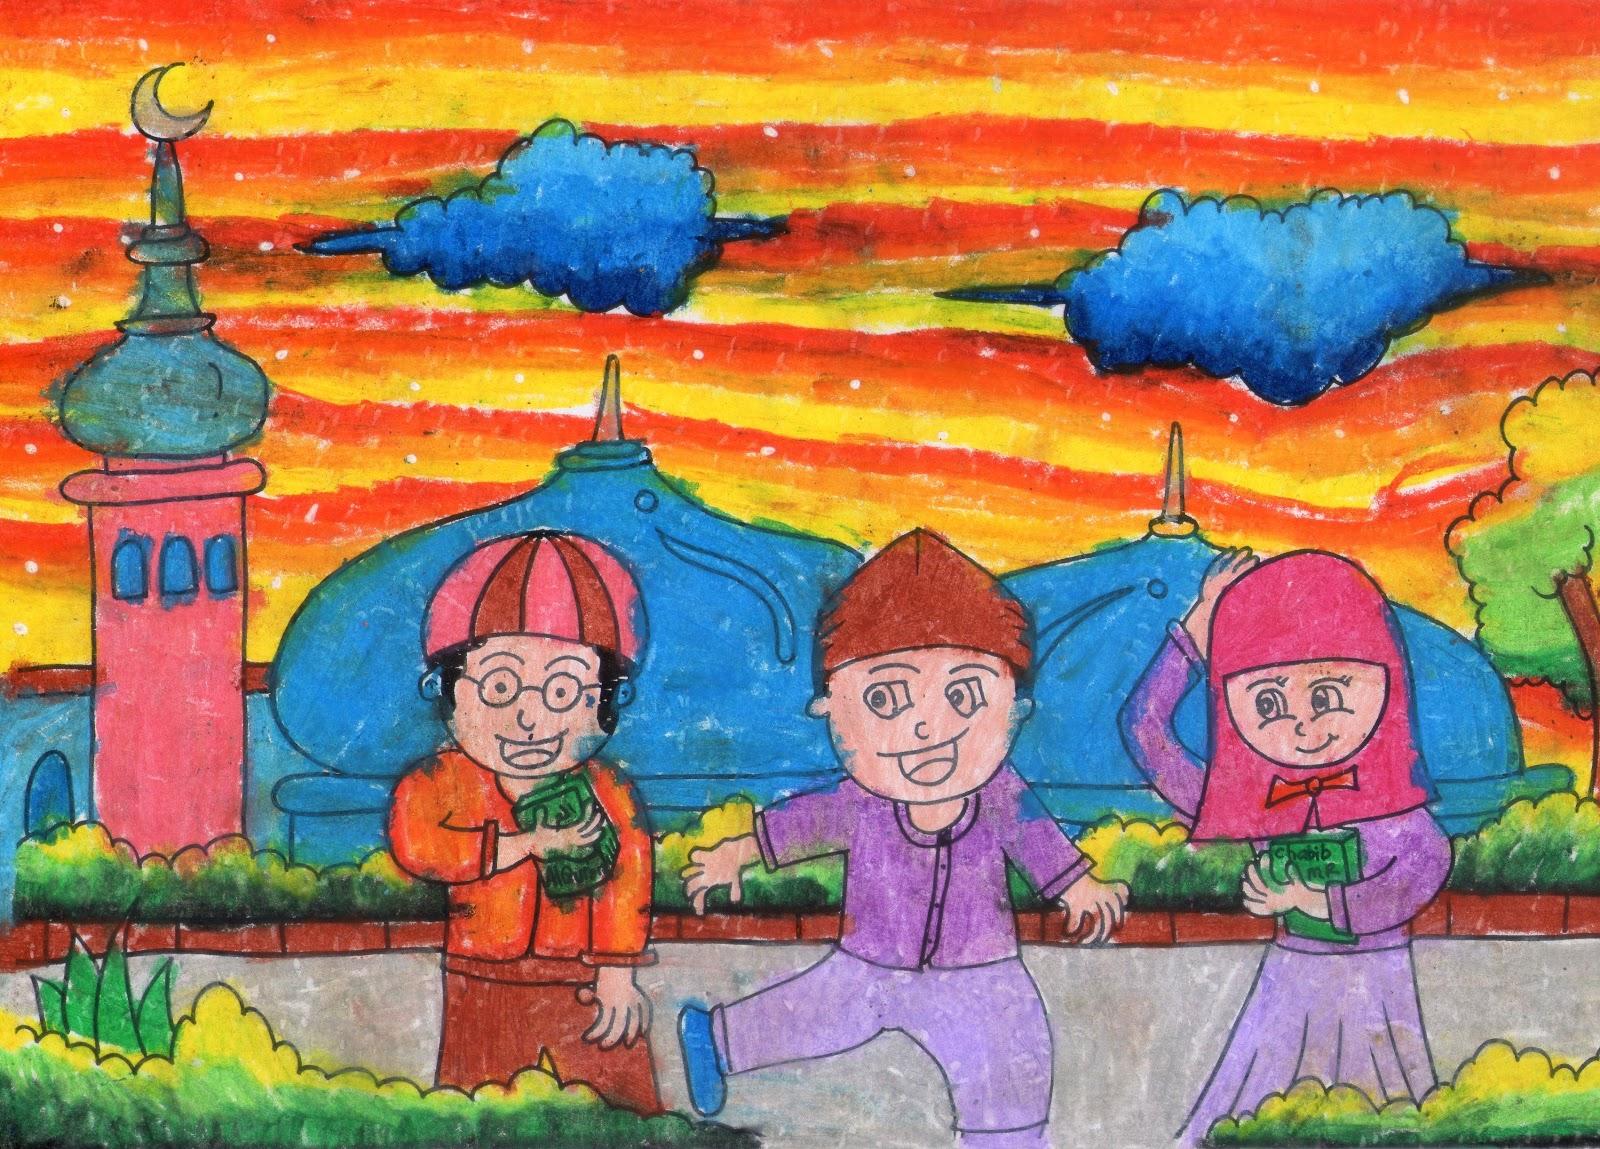 Pengumuman Juara Festival Anak Sholih VII MI Murni Sunan